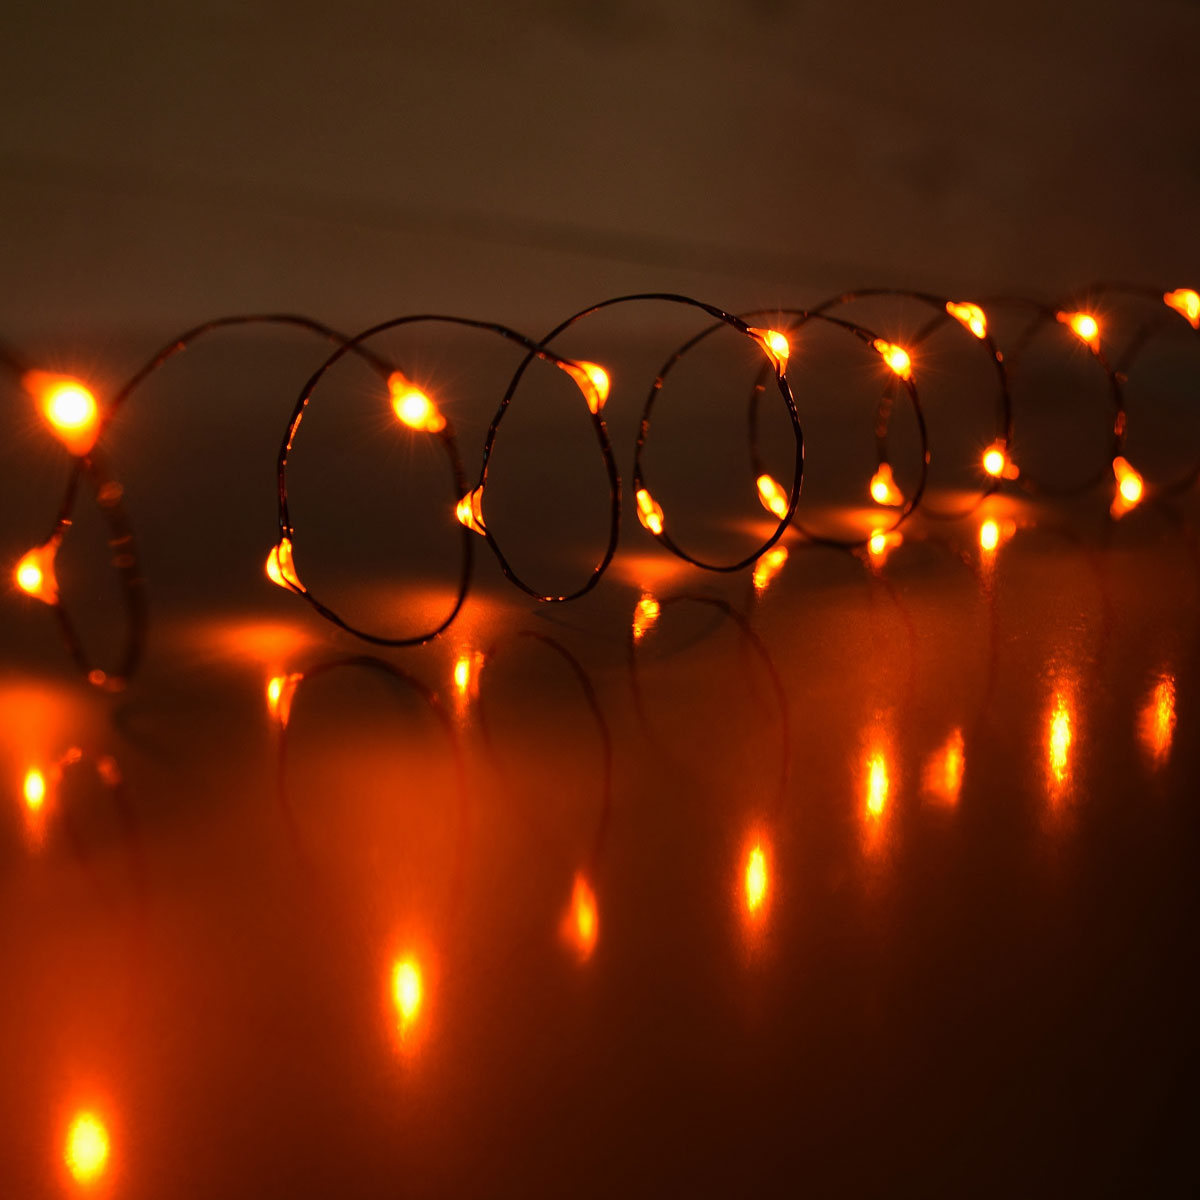 Orange LED Battery Operated Mini Lights